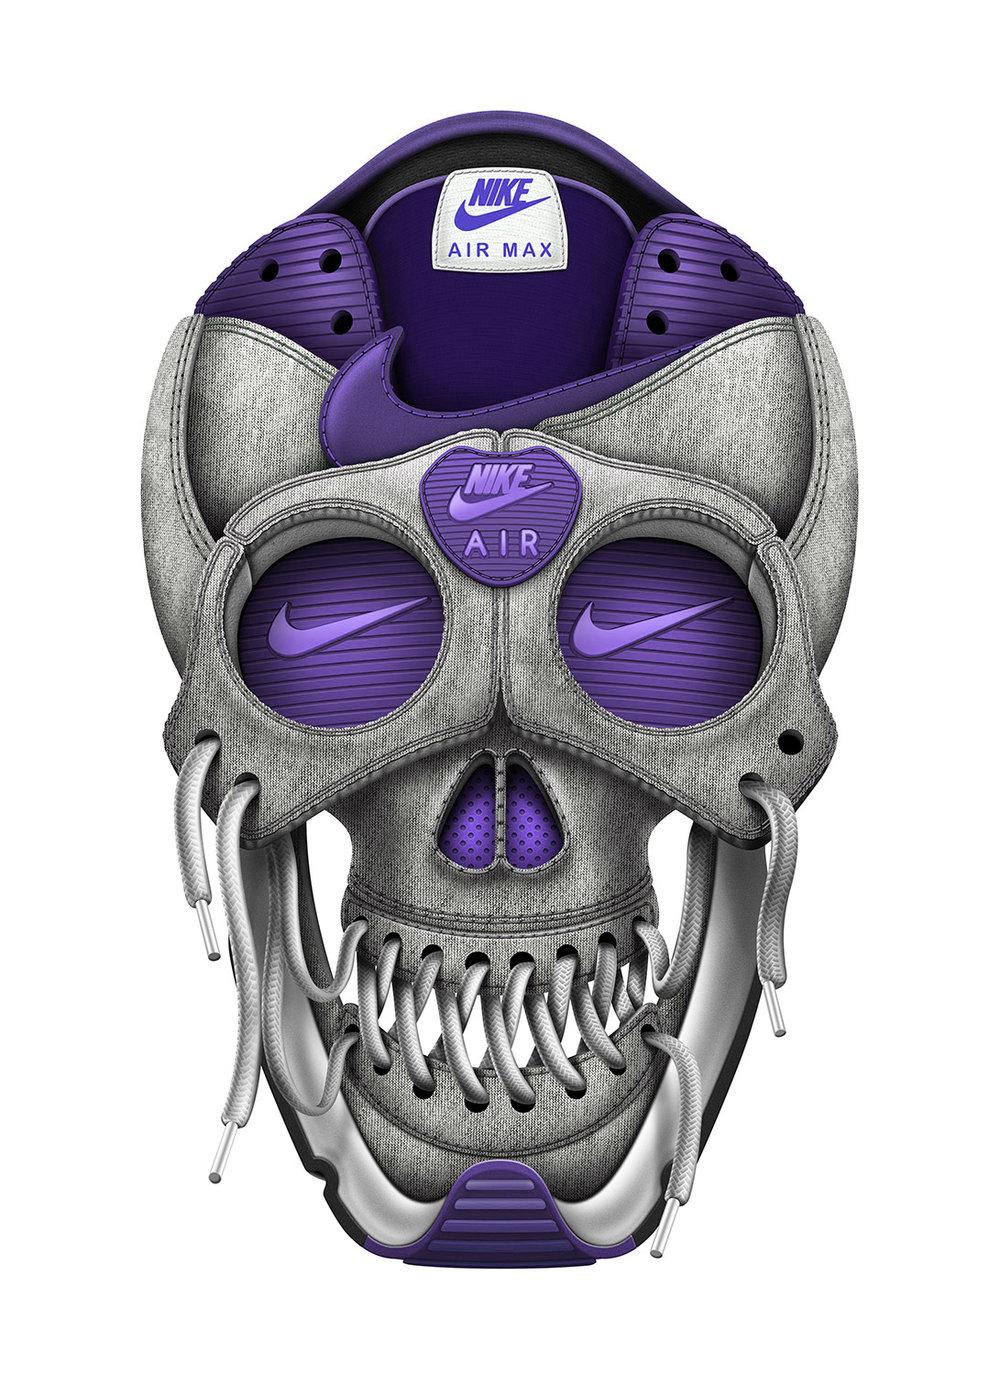 130925_Nike_skull_airmax_grey-blue_02A.jpg